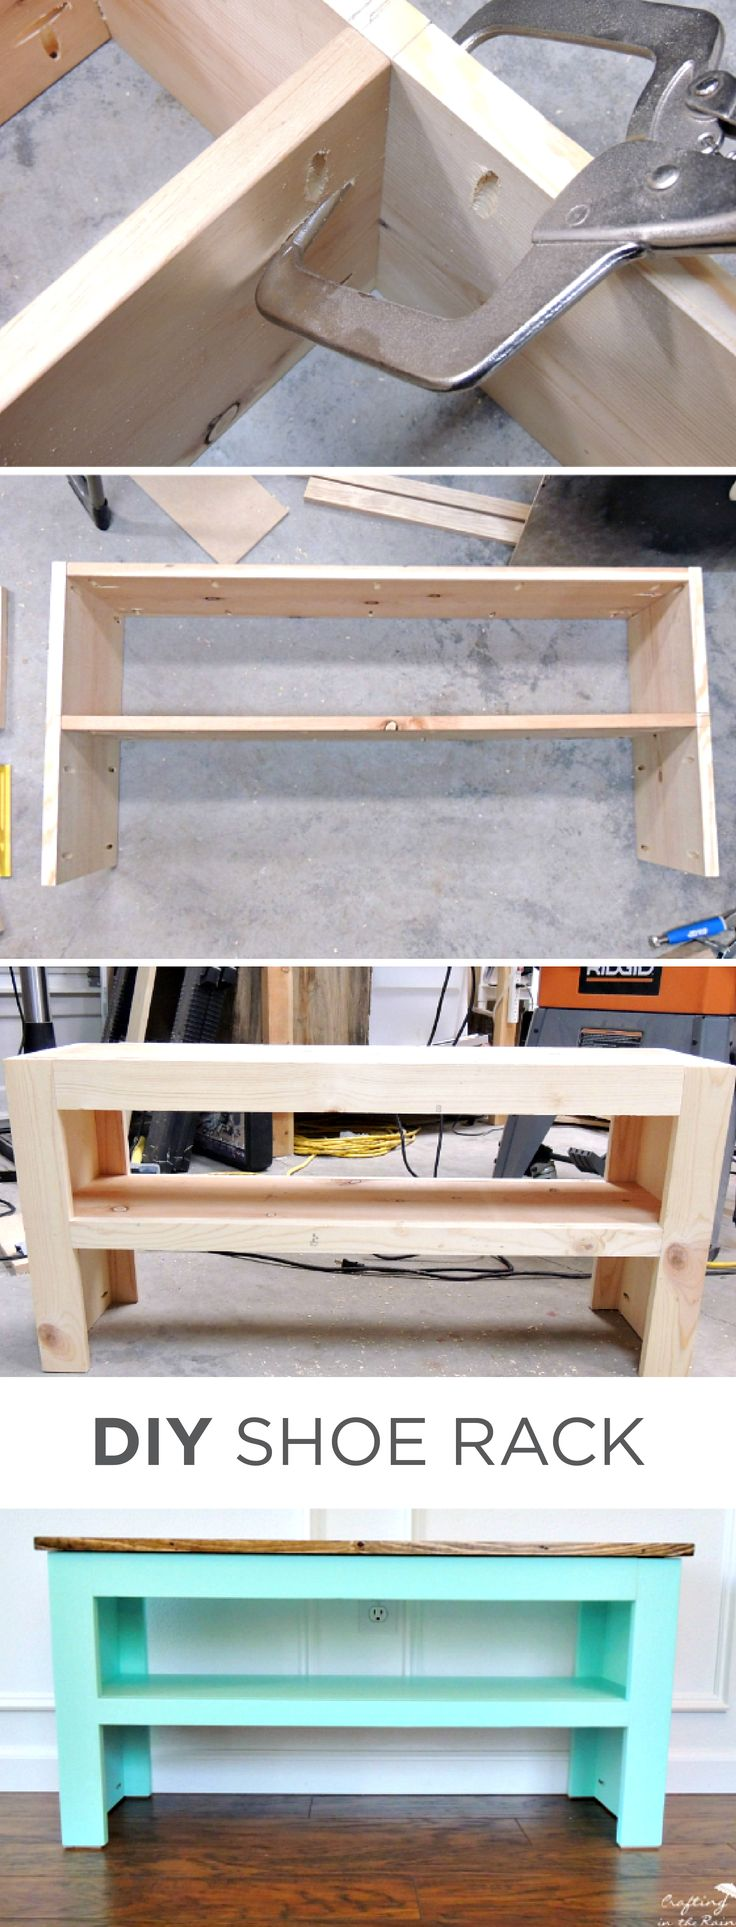 diy shoe bench diy shoe storage wooden shoe racks diy on wood shoe rack diy simple id=52160